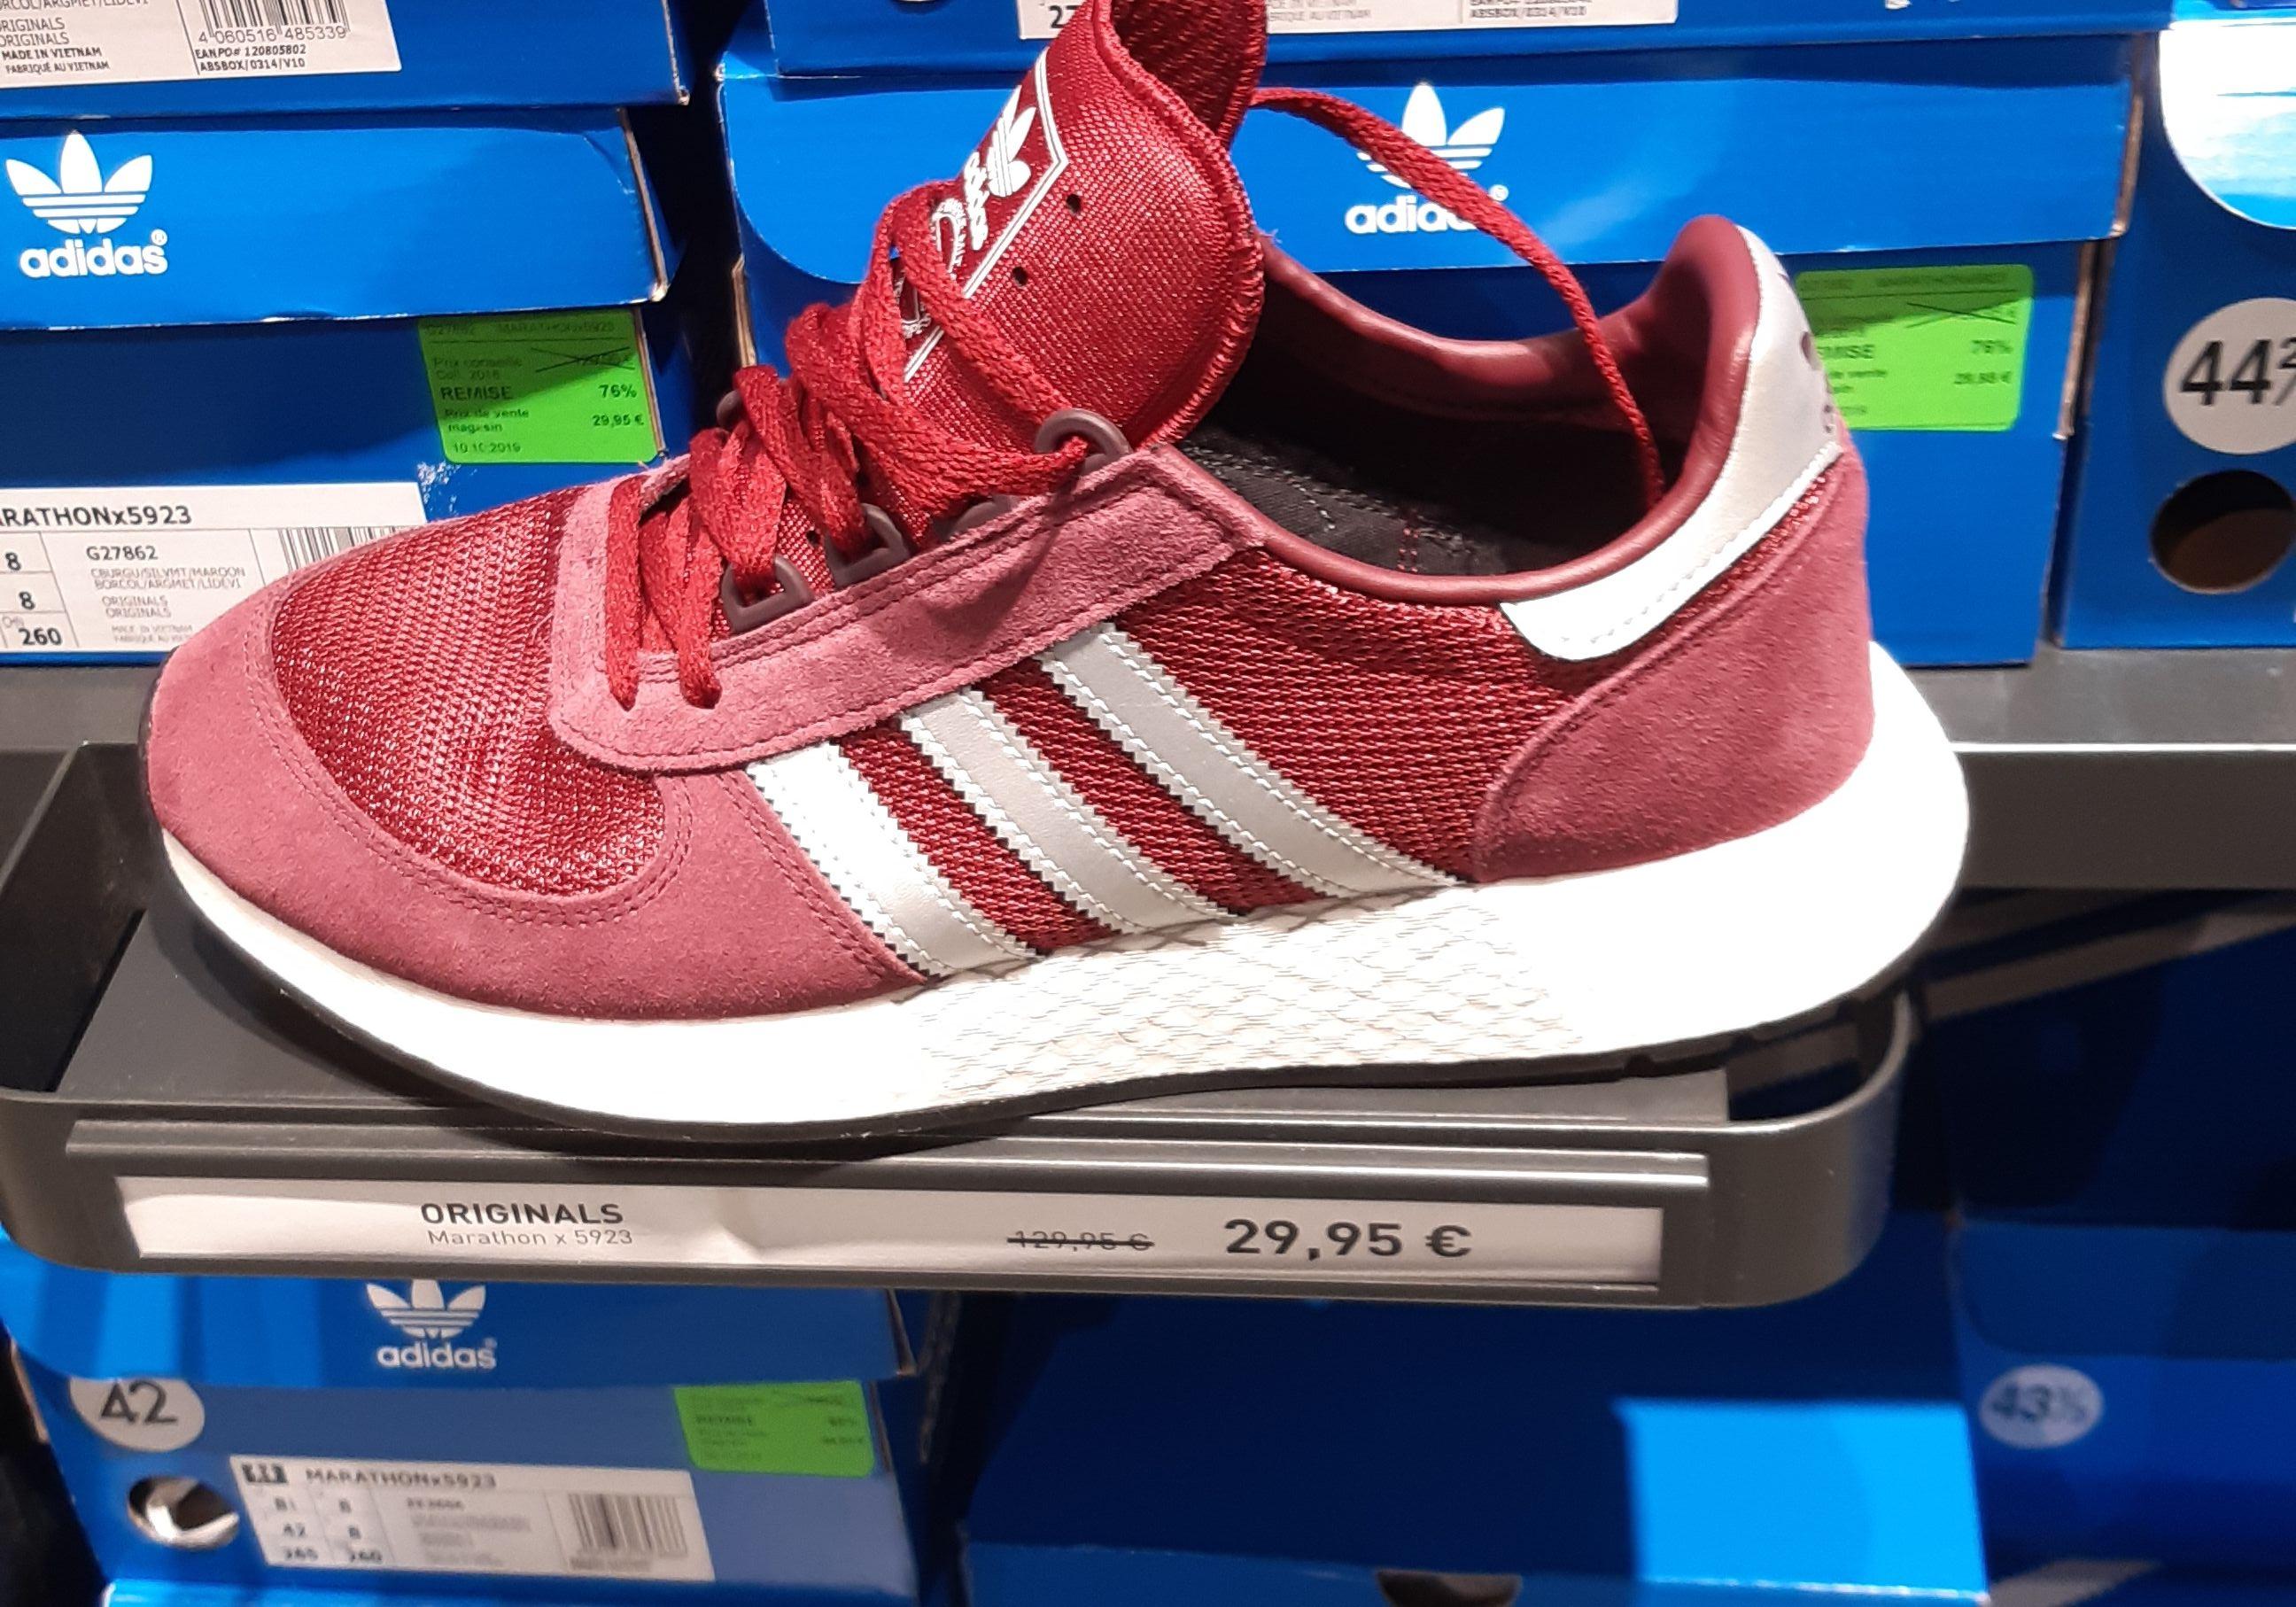 Chaussures Adidas Marathon 5963 - Adidas outlet Villefontaine (38)